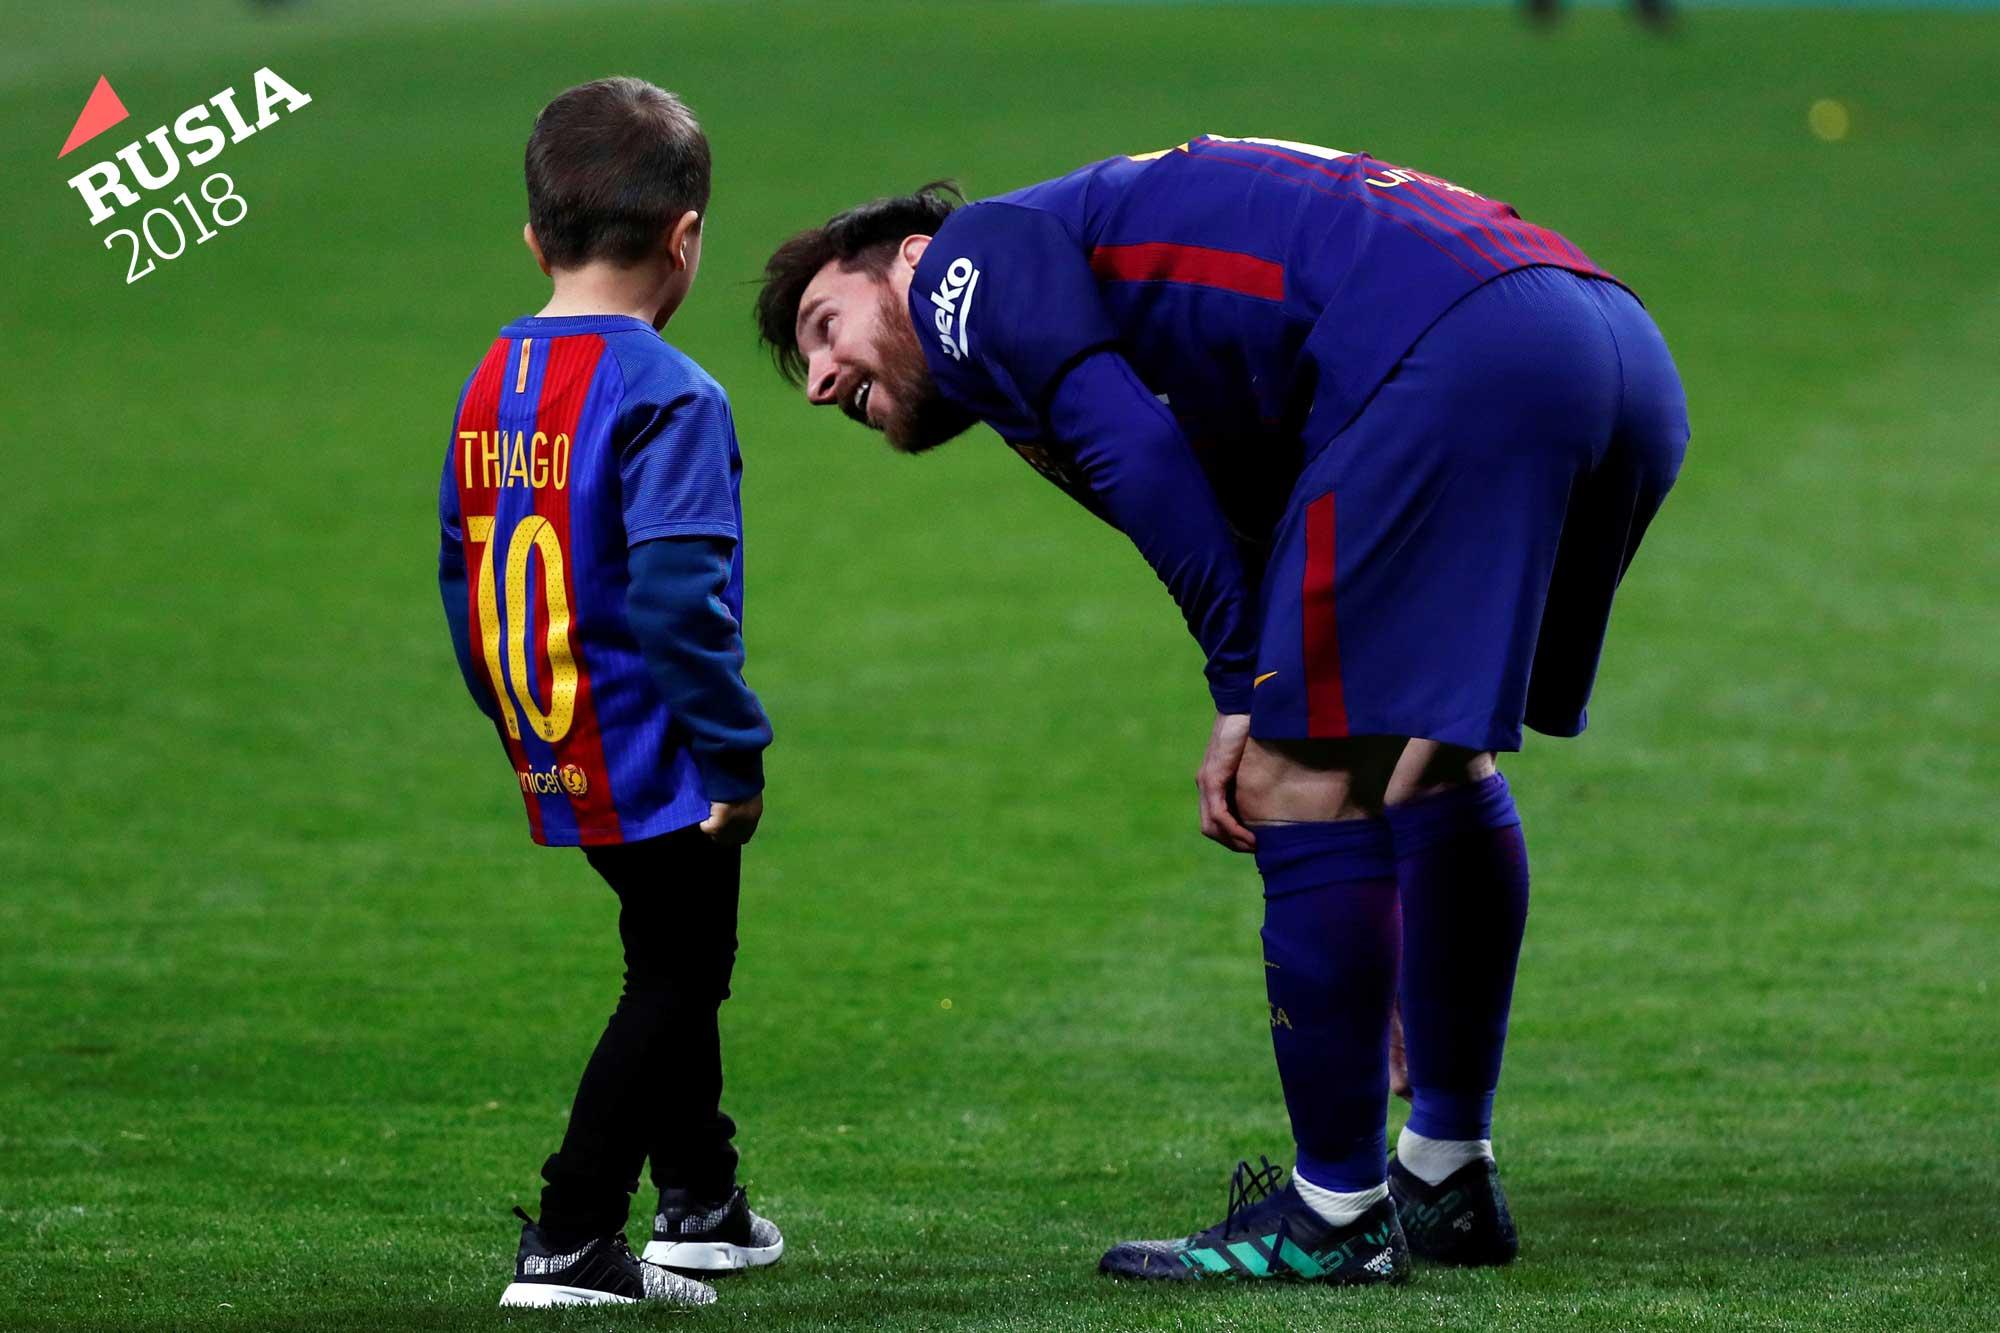 Habló Lionel Messi  la teoría divina sobre su talento 57b99ba07d747